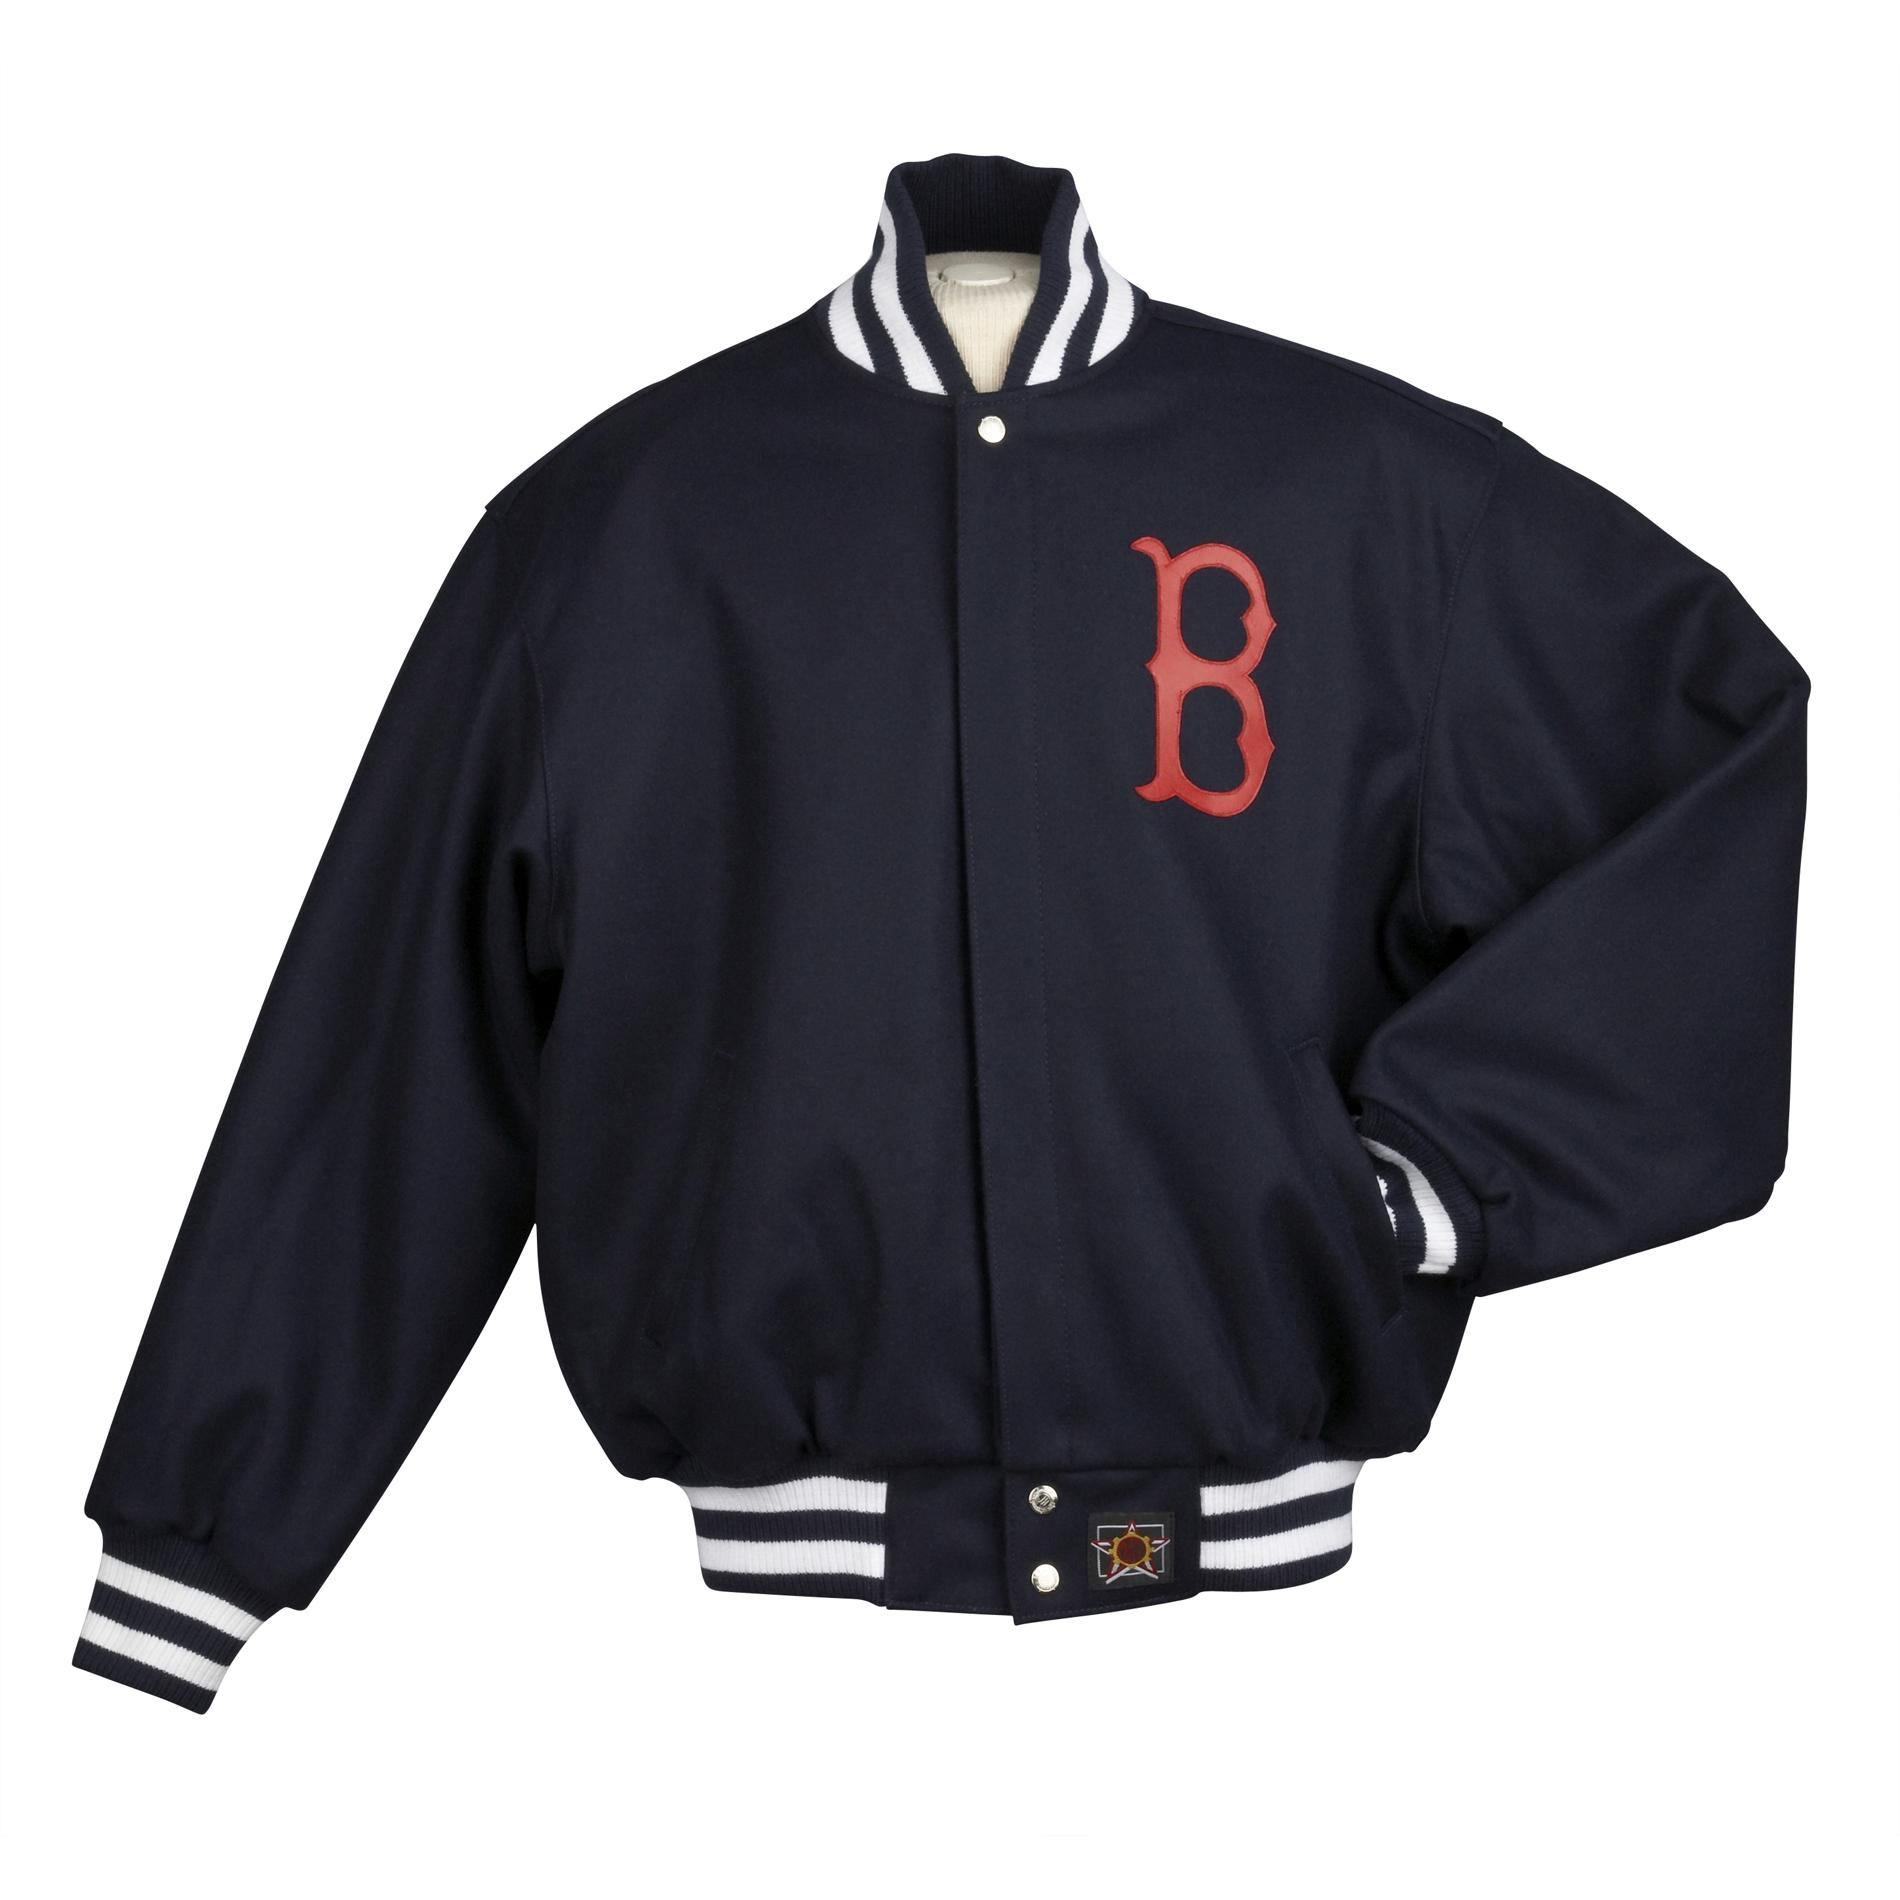 jh designs men's boston red sox domestic wool jacket - free